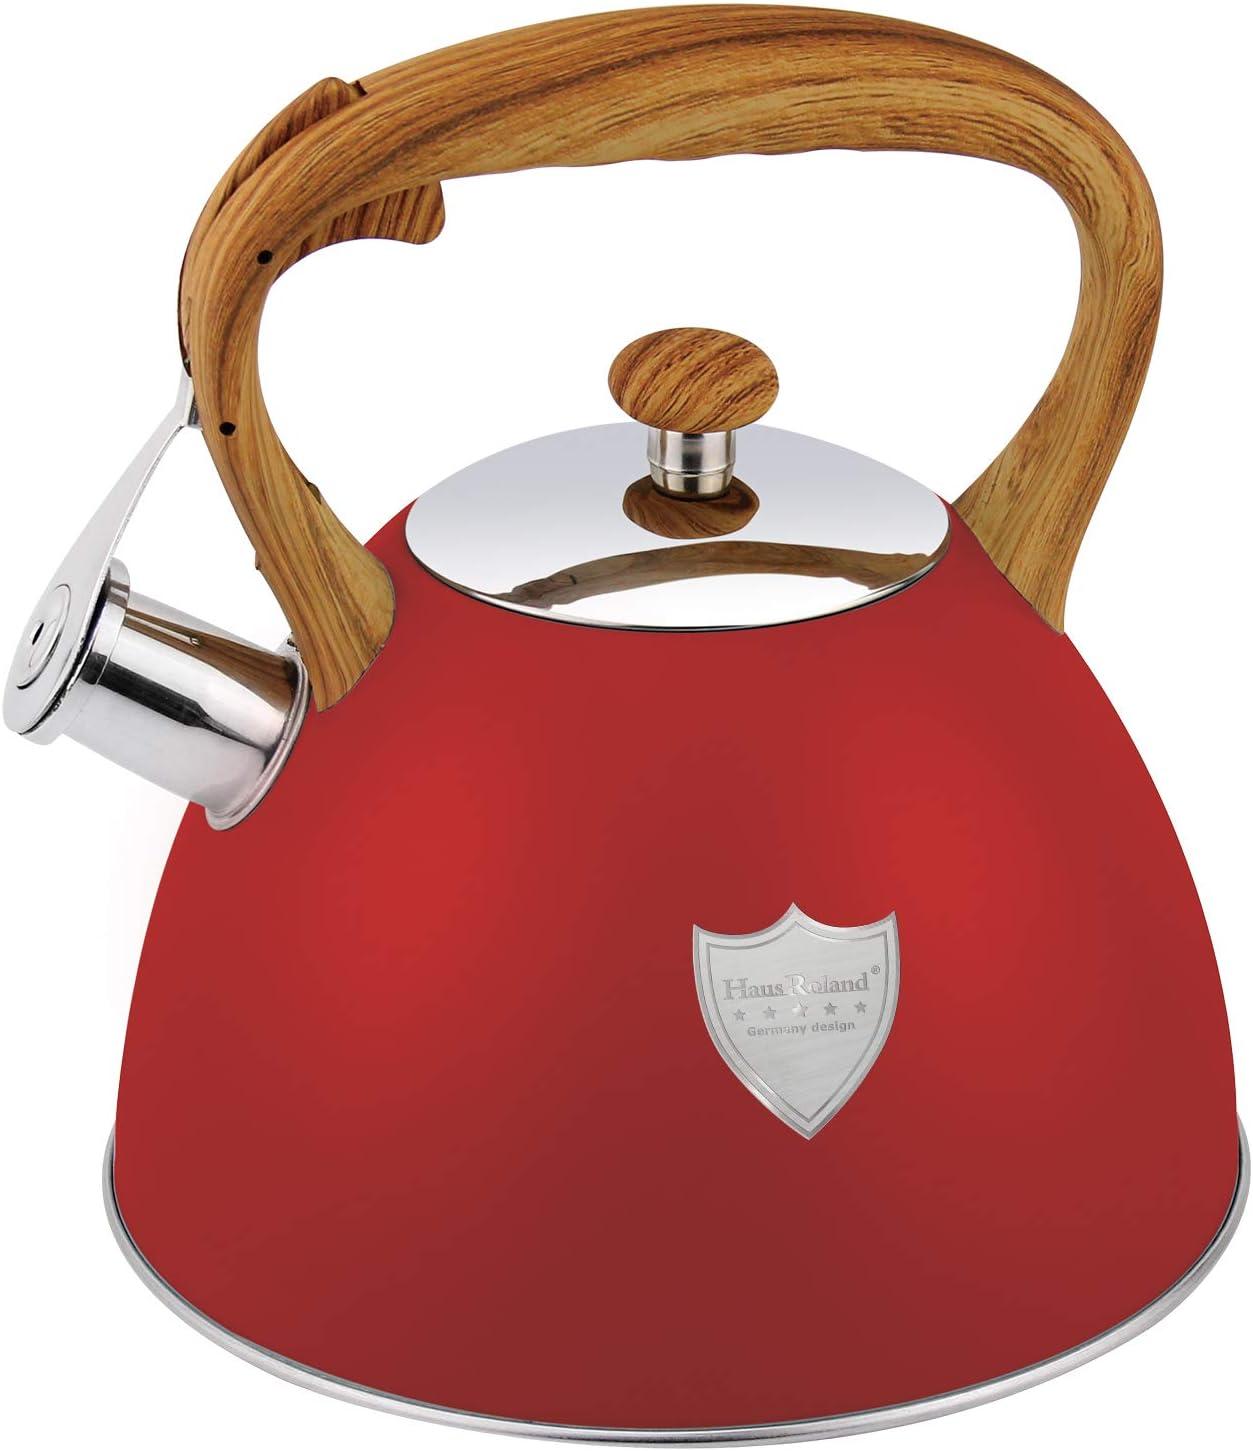 3L Tea Kettle Stovetop Whistling Arlington Mall 5 ☆ popular Pot Grade Teakettle Food St